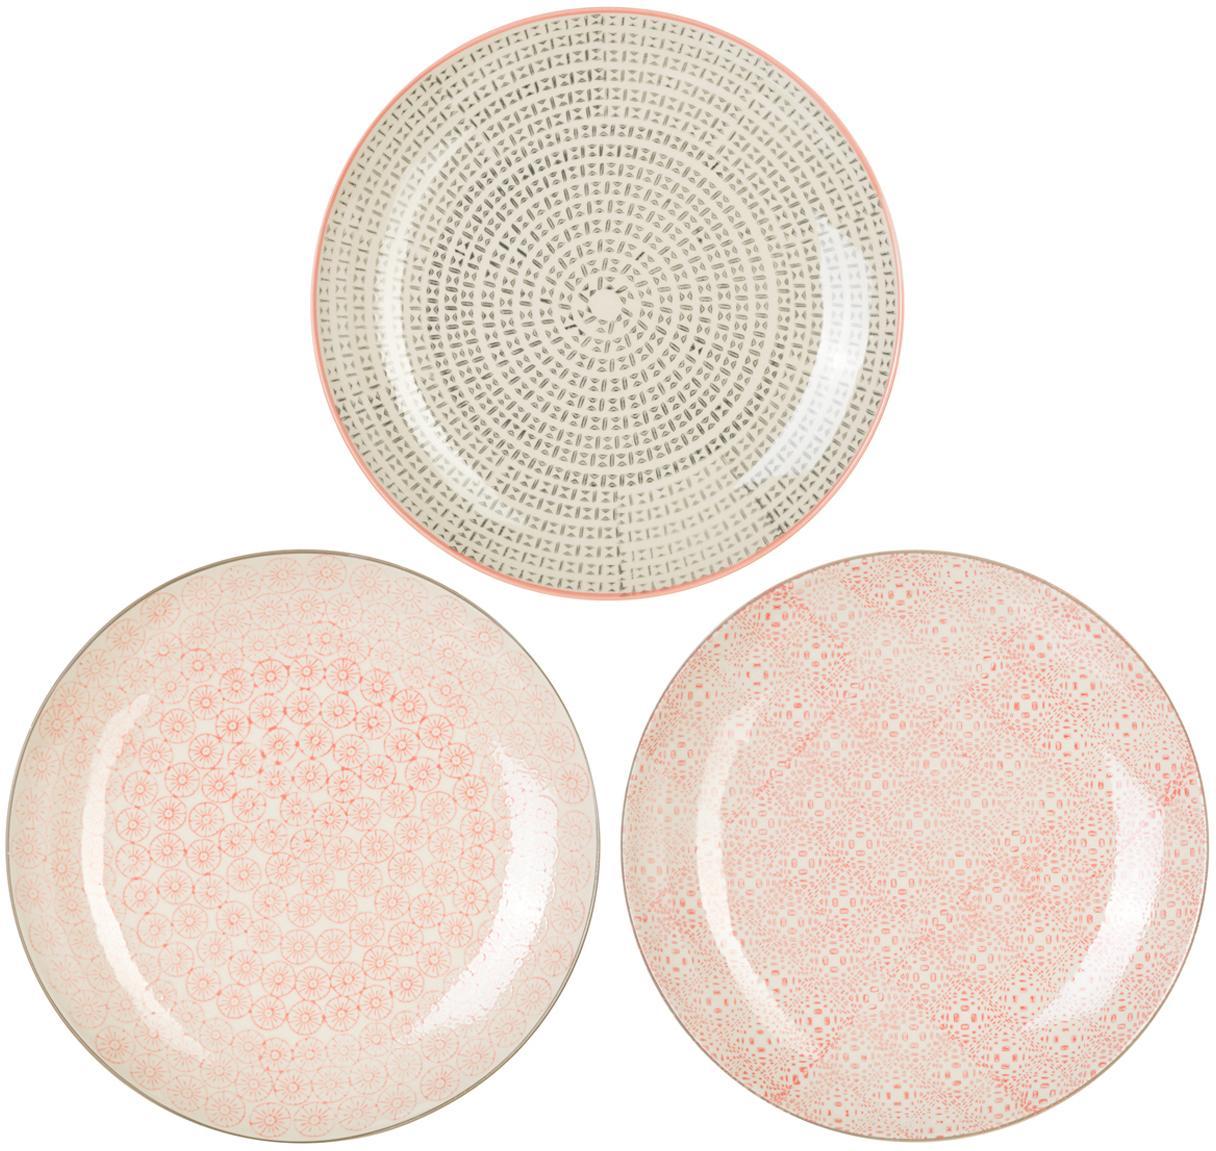 Speiseteller Cécile mit kleinem Muster, 3er-Set, Steingut, Mehrfarbig, Ø 25 cm